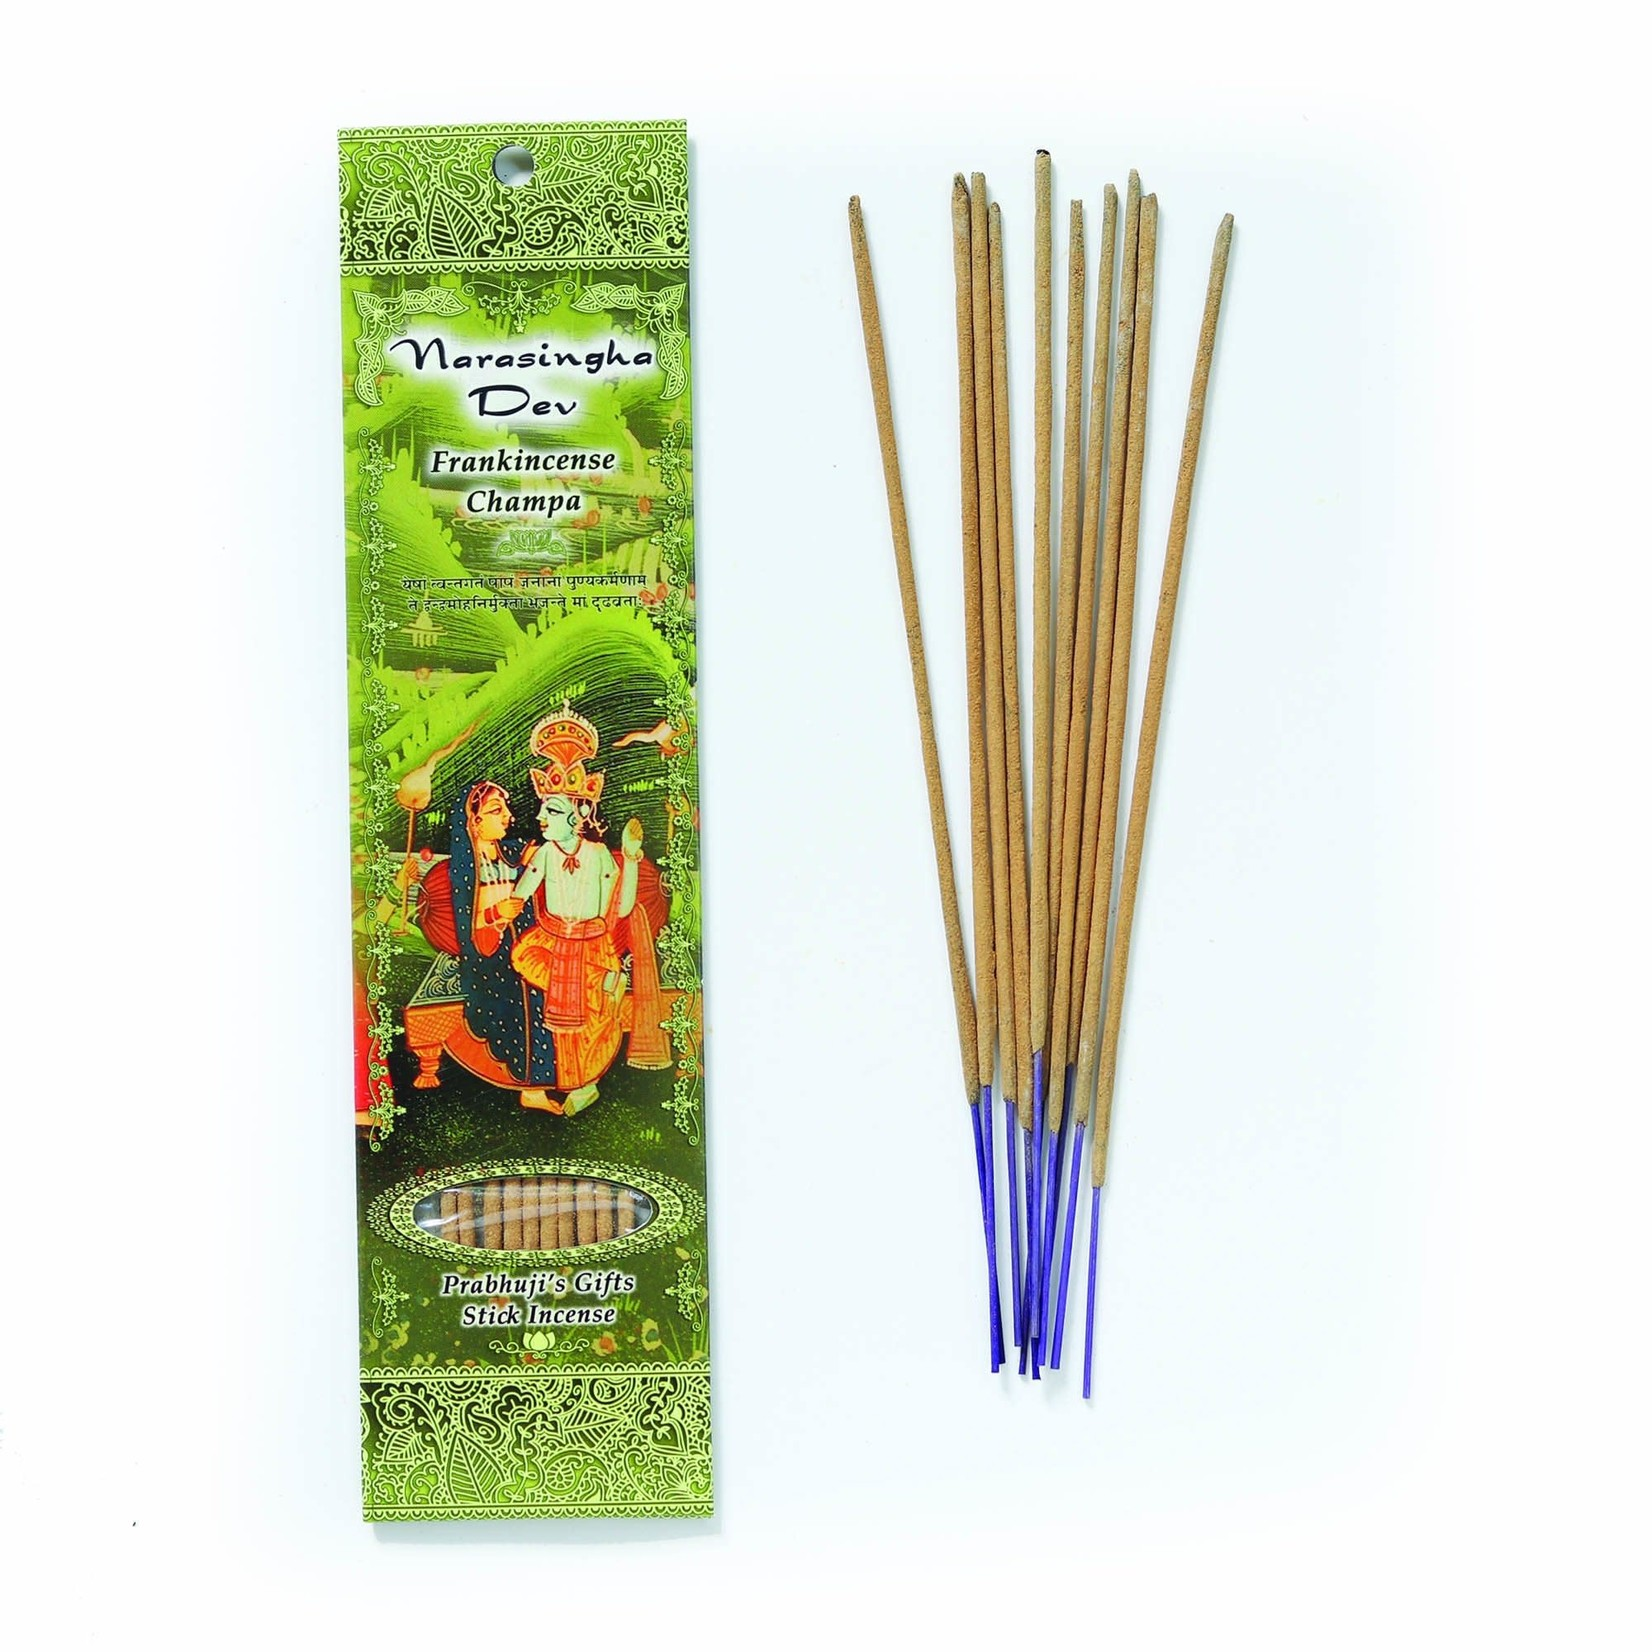 Prabhujis Gifts Narasingha Dev - Frankincense Champa Incense Sticks